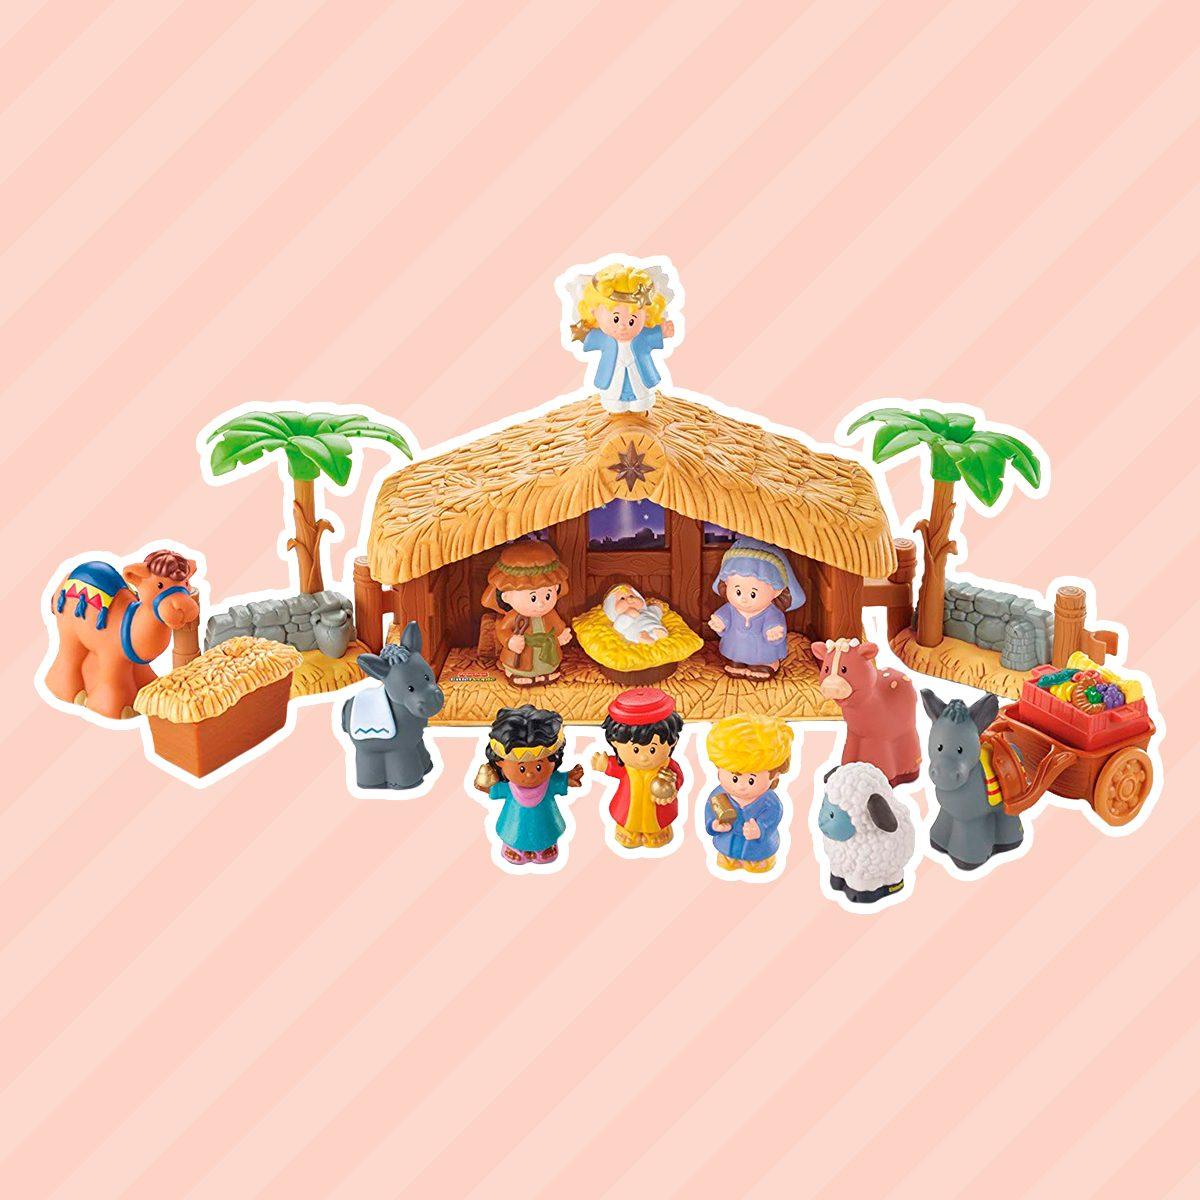 Little People Nativity Play Set